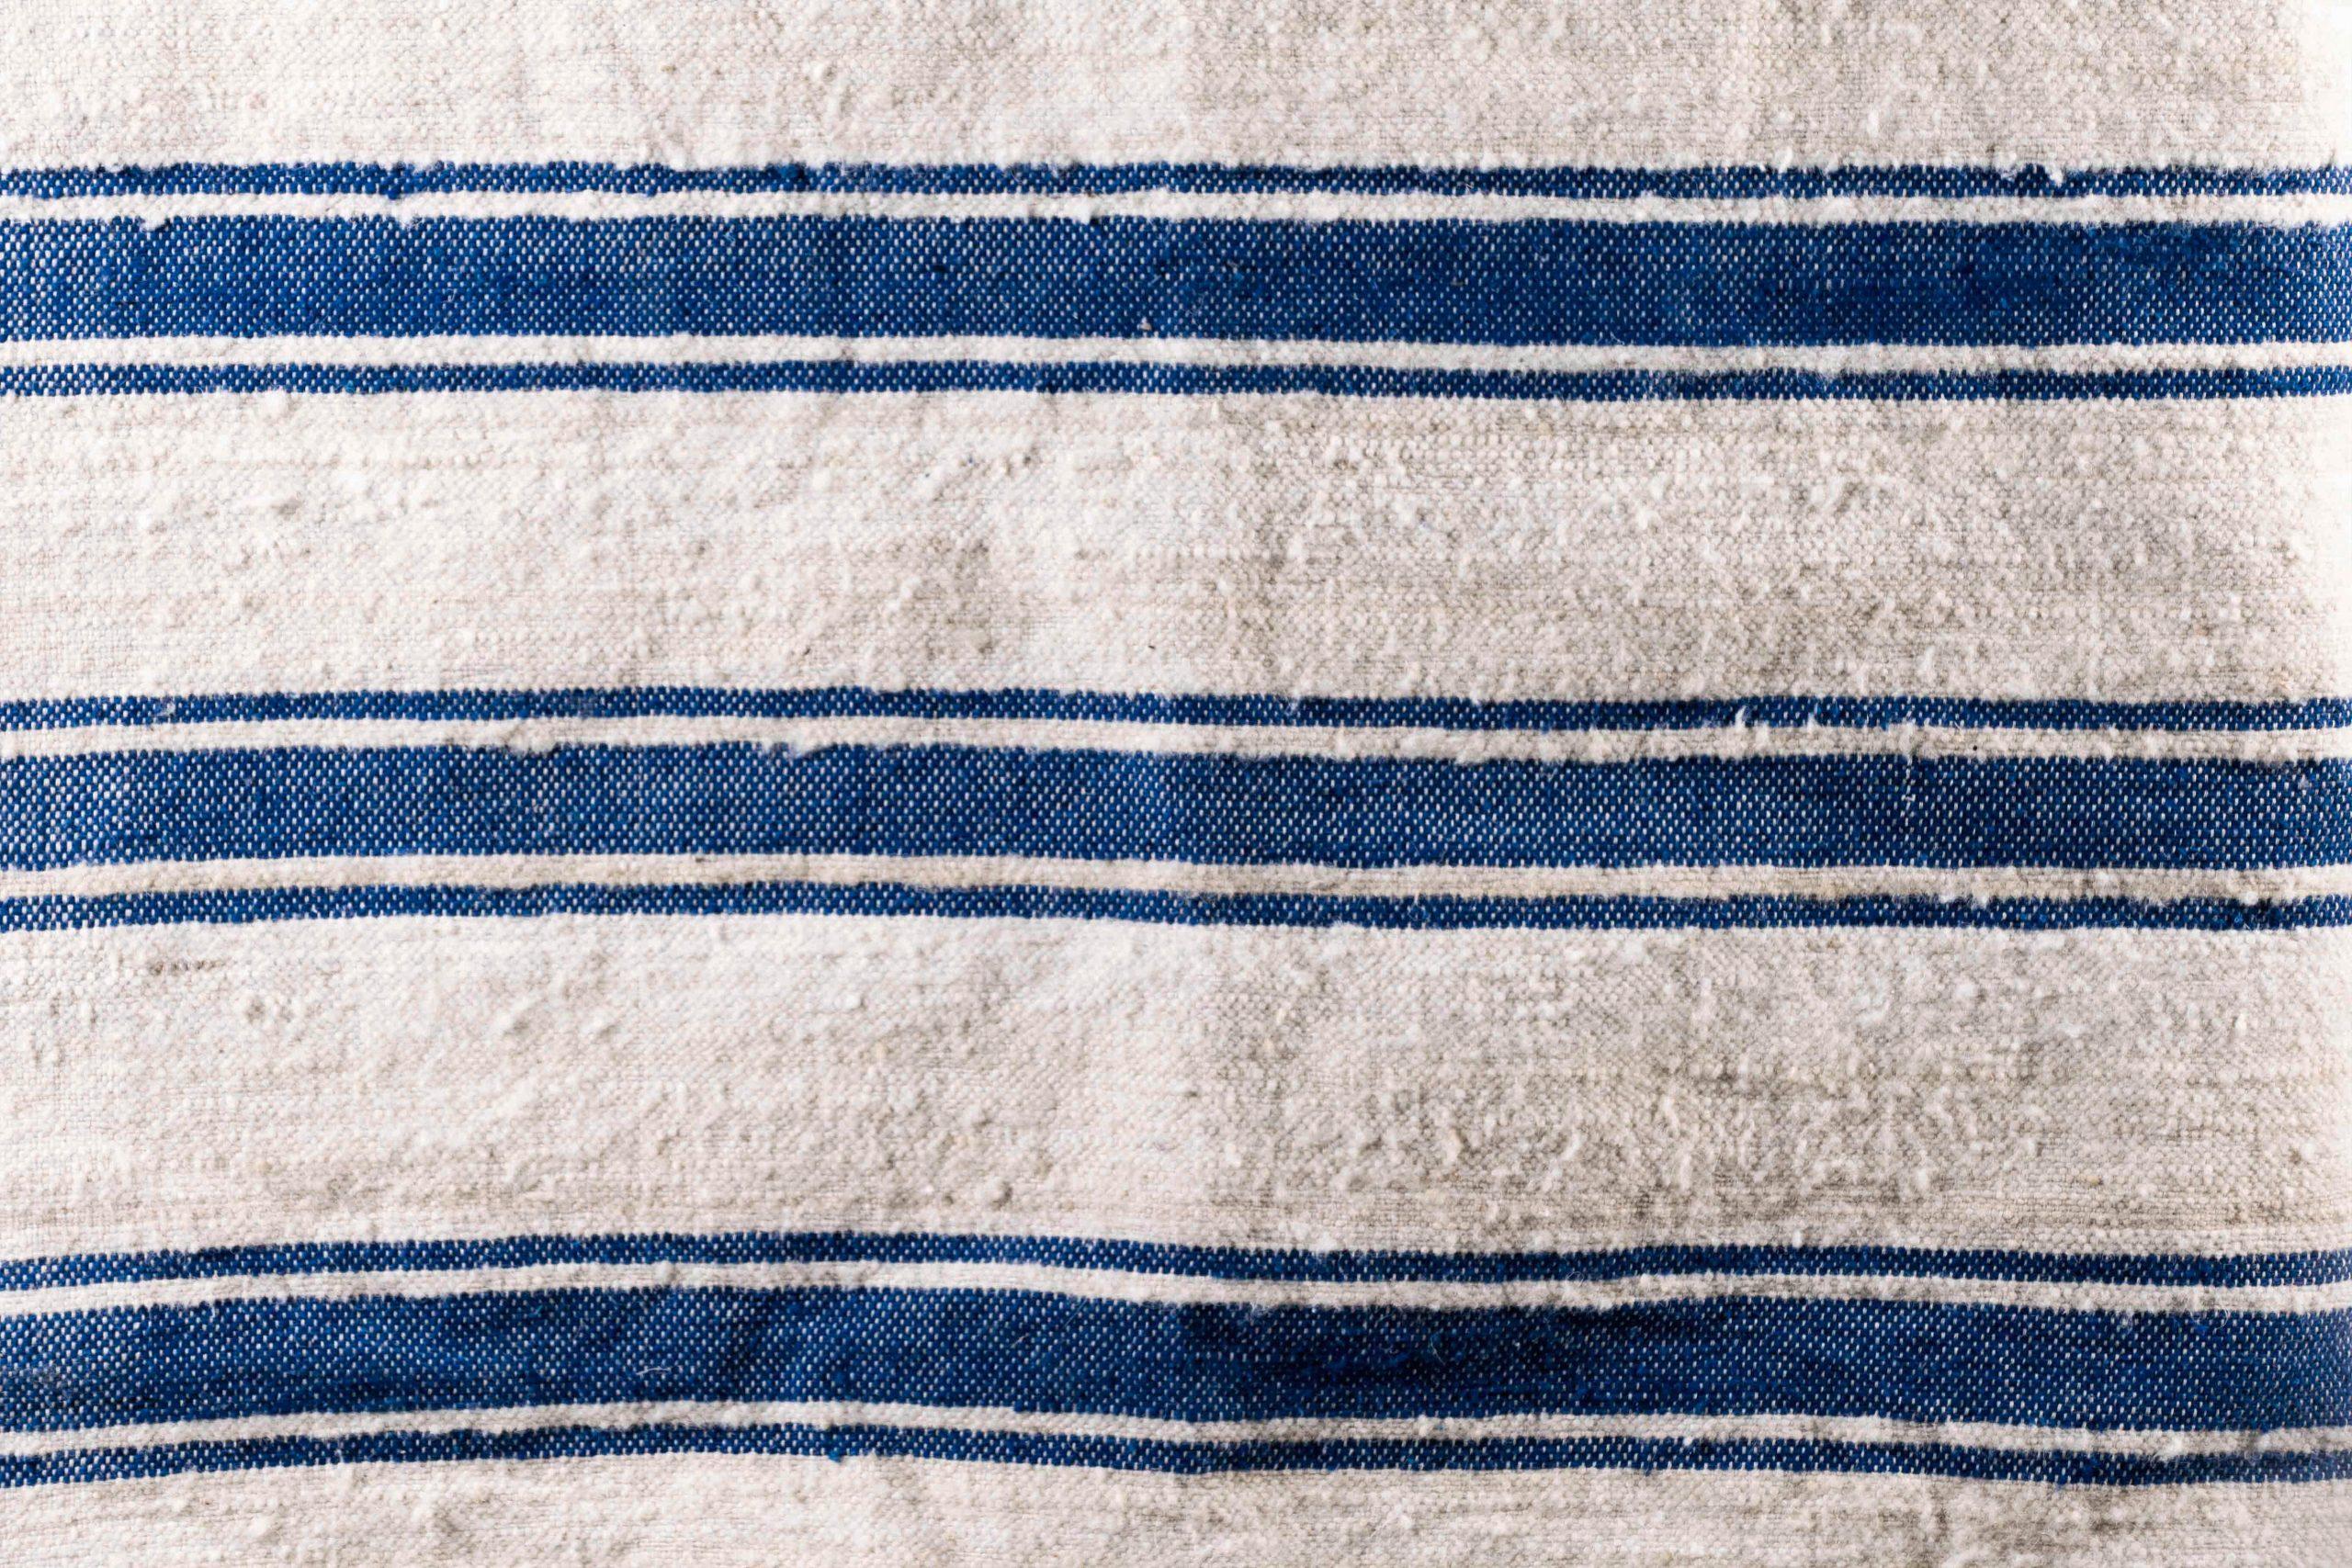 Alfombra azul de salon de mesa alfombra pepita lana azul marroqui de color azul